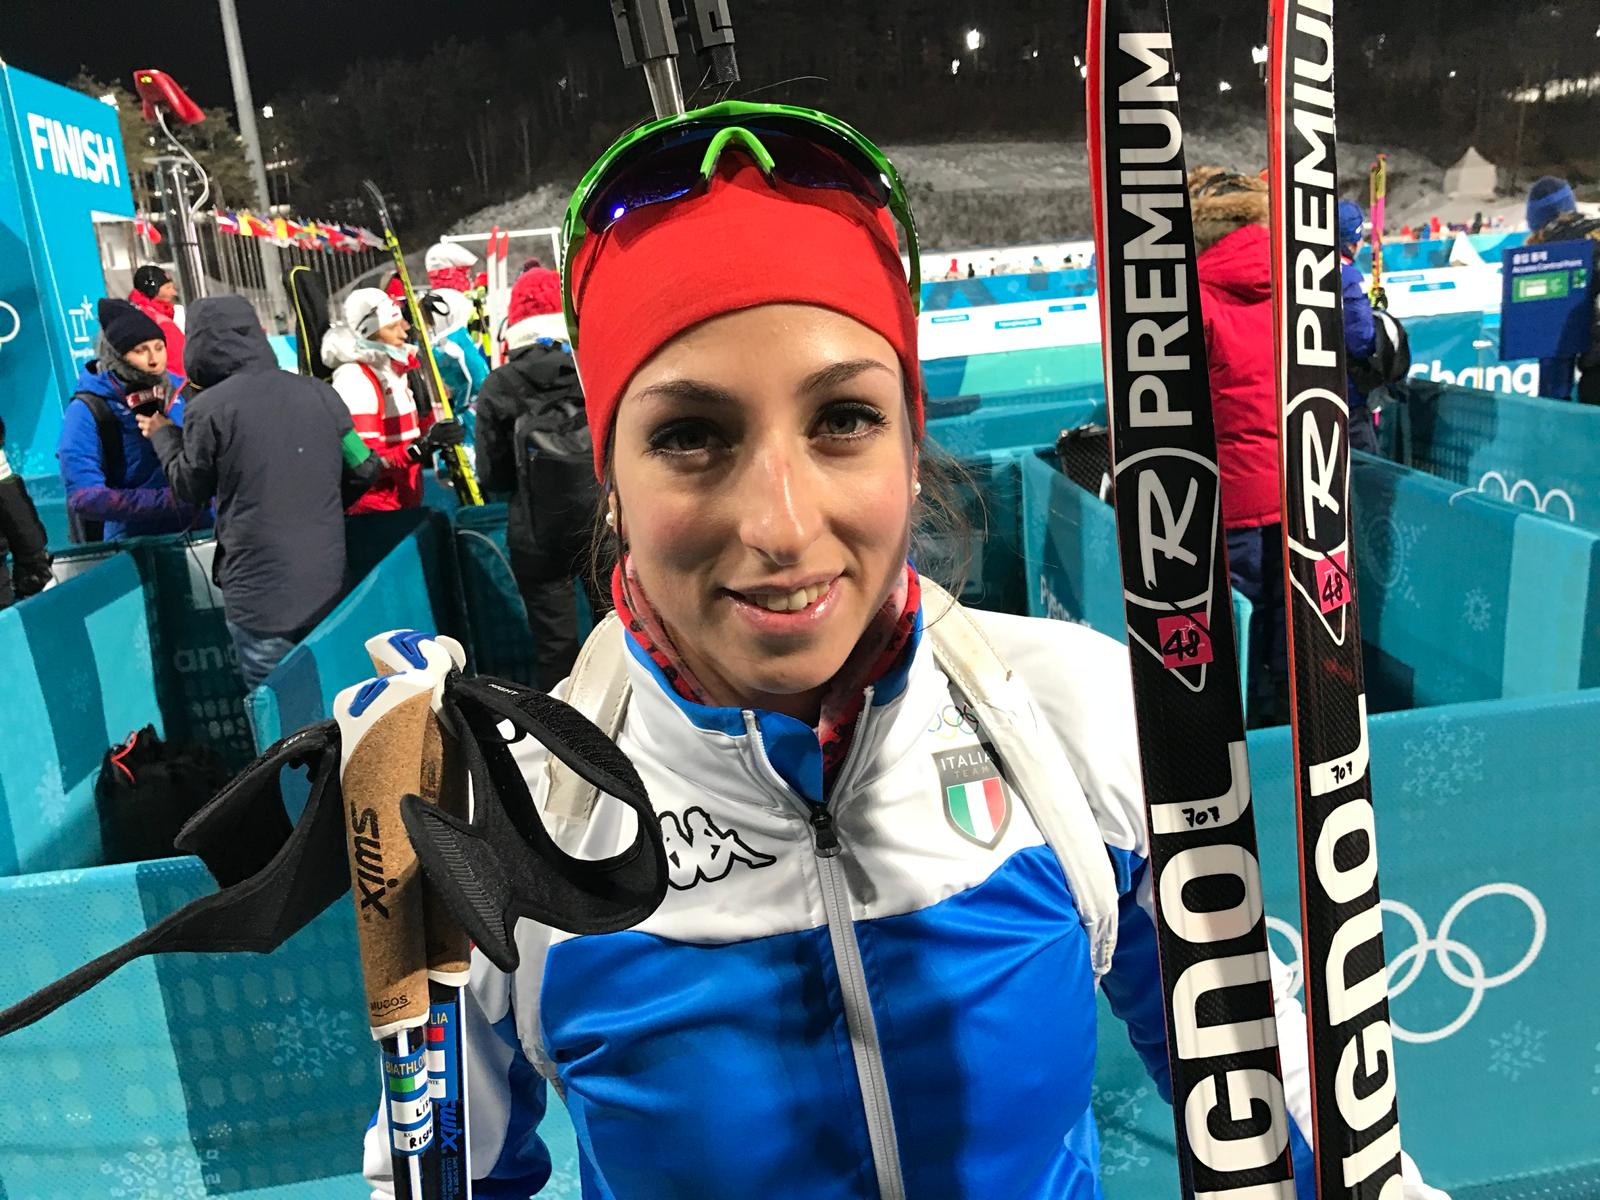 Olimpiadi invernali: disgelo tra le due Coree